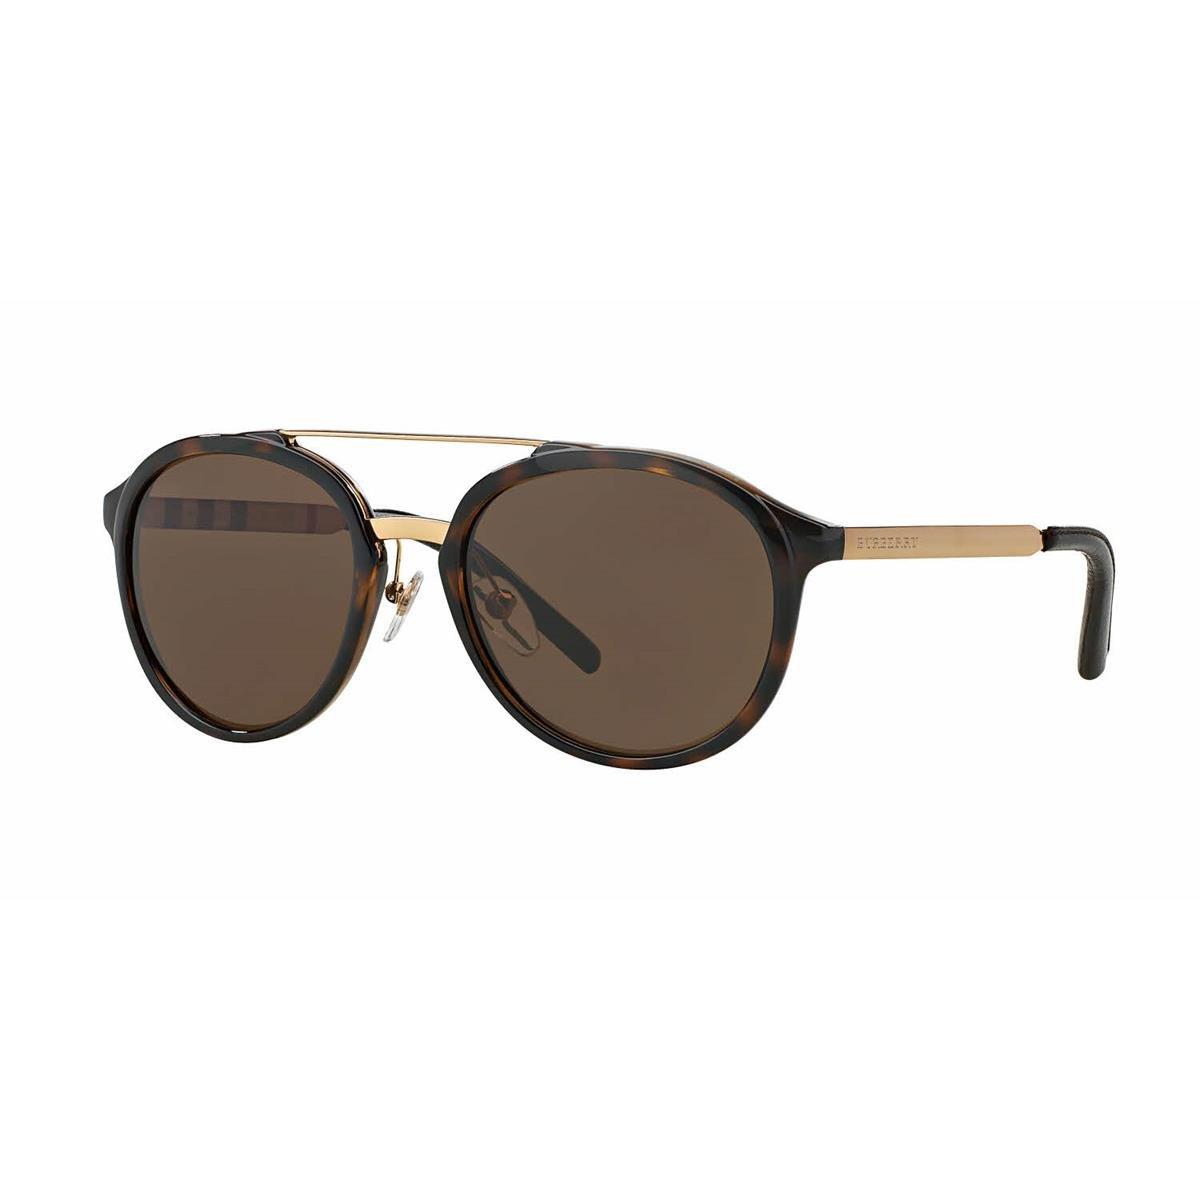 Burberry Glasses Frame Parts : Galleon - Burberry BE4168Q Sunglasses 300273-54 - Tortoise ...